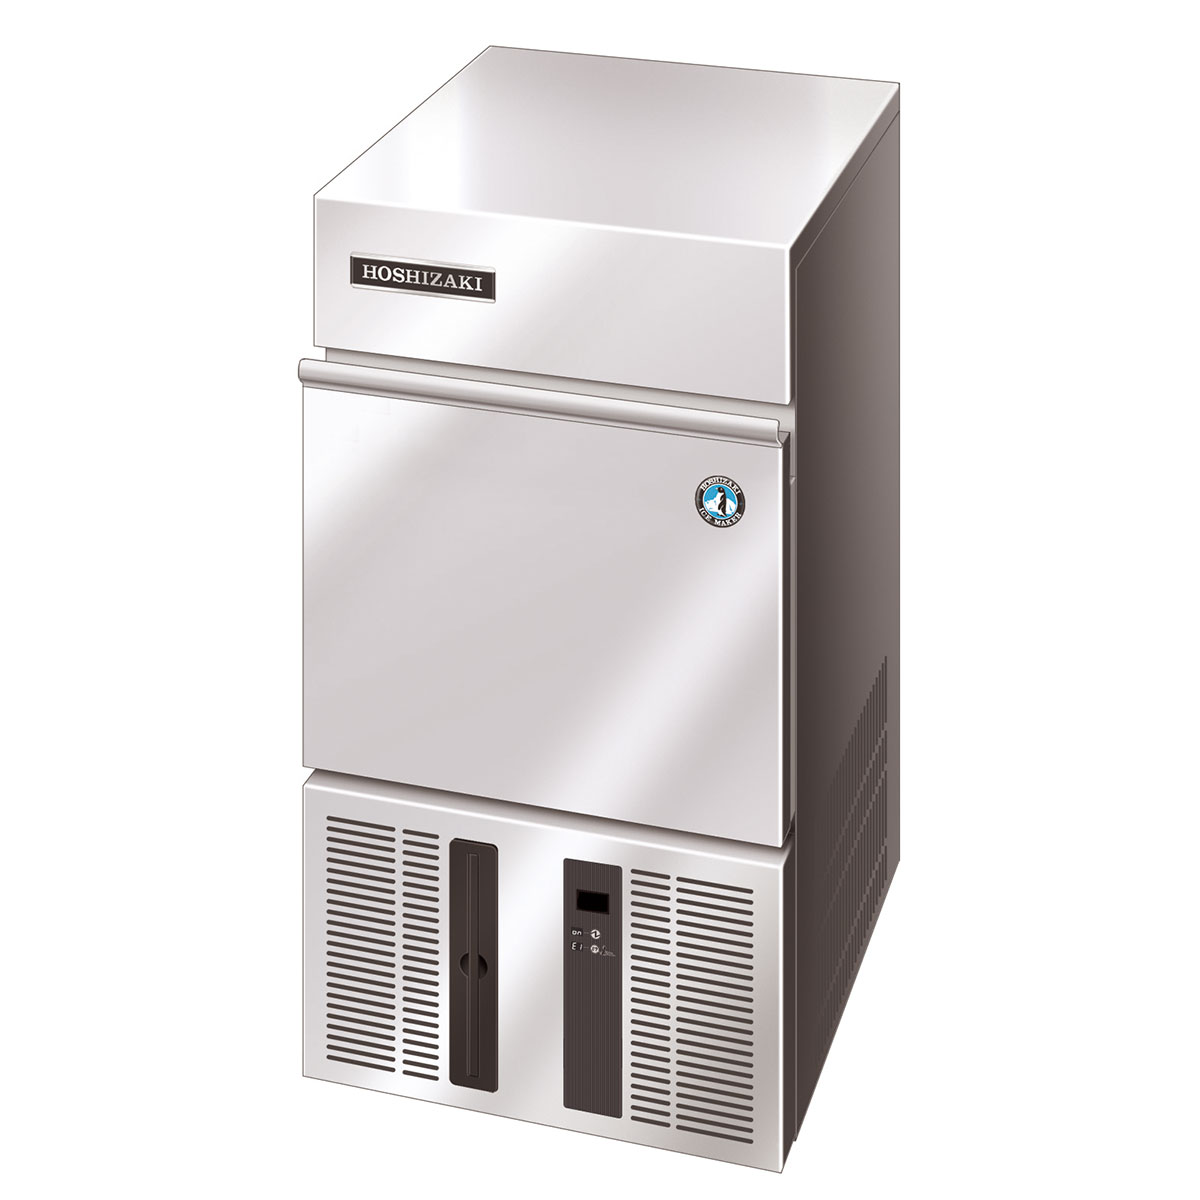 Hoshizaki IM 21CNE HC 1 - Refrigeration Equipment Suppliers in Cornwall